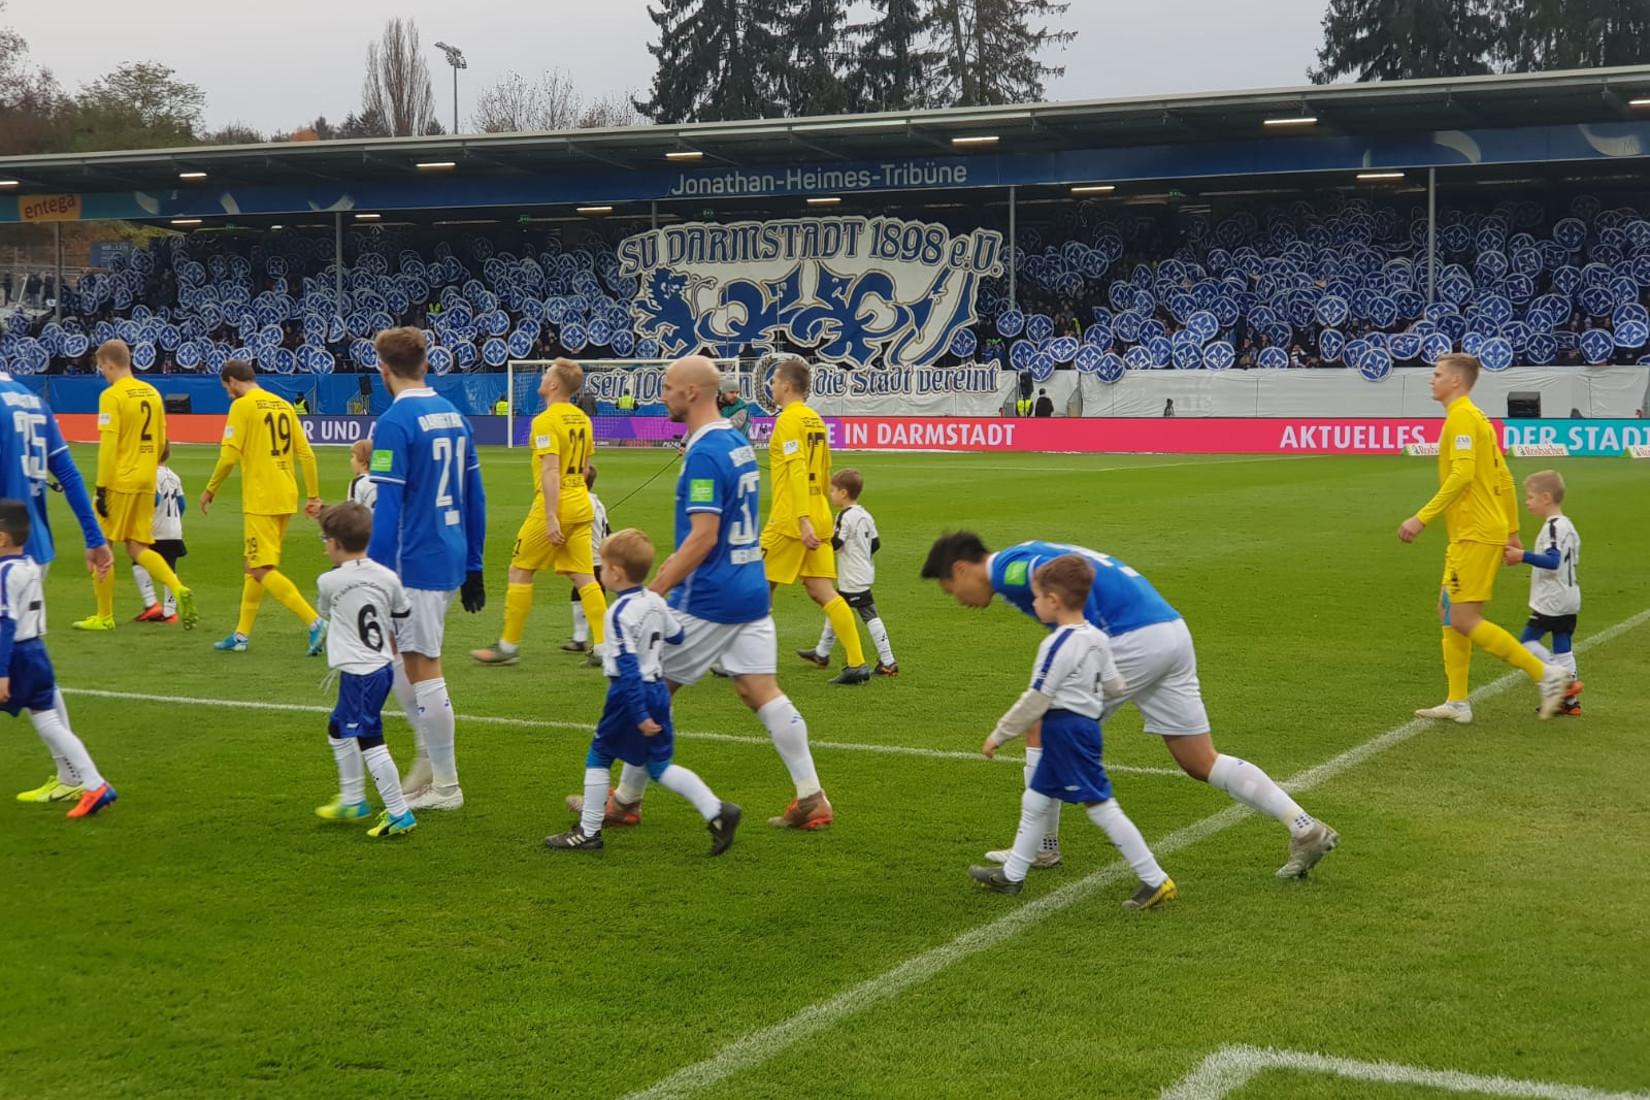 SV Darmstadt 98 – Arminia Bielefeld 1:3 (0:0)